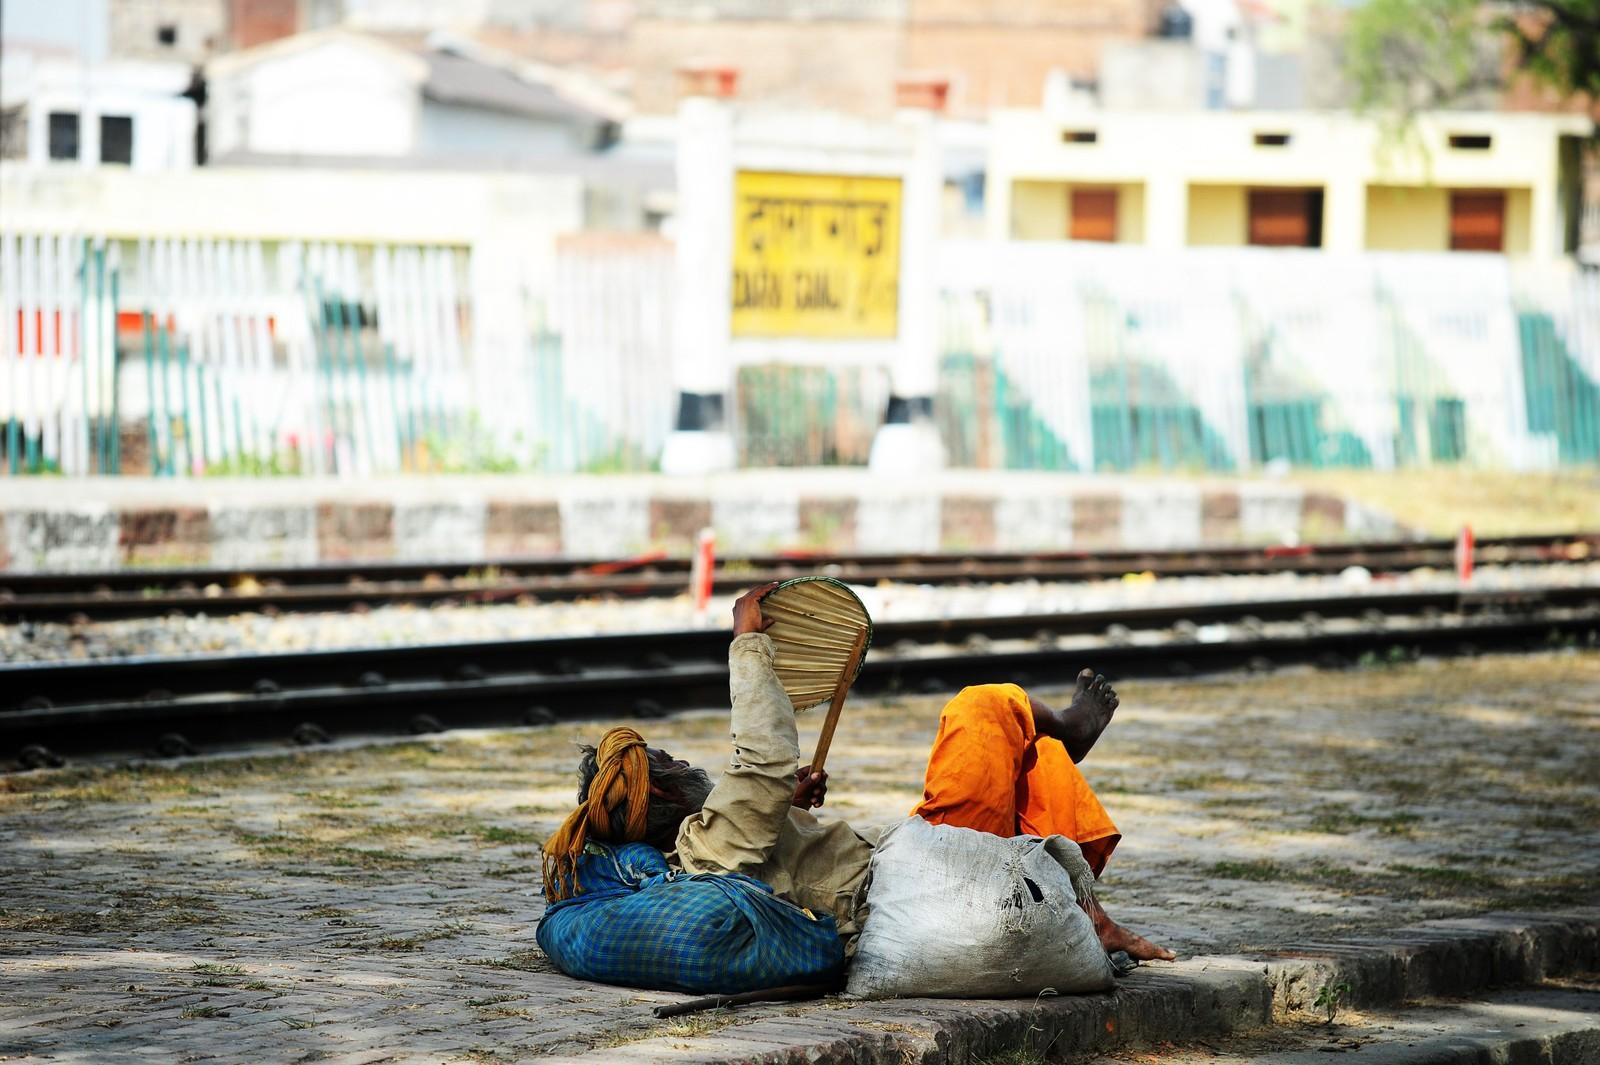 En mann kjøler seg ned med en vifte mens han venter på toget i Allahabad i India.